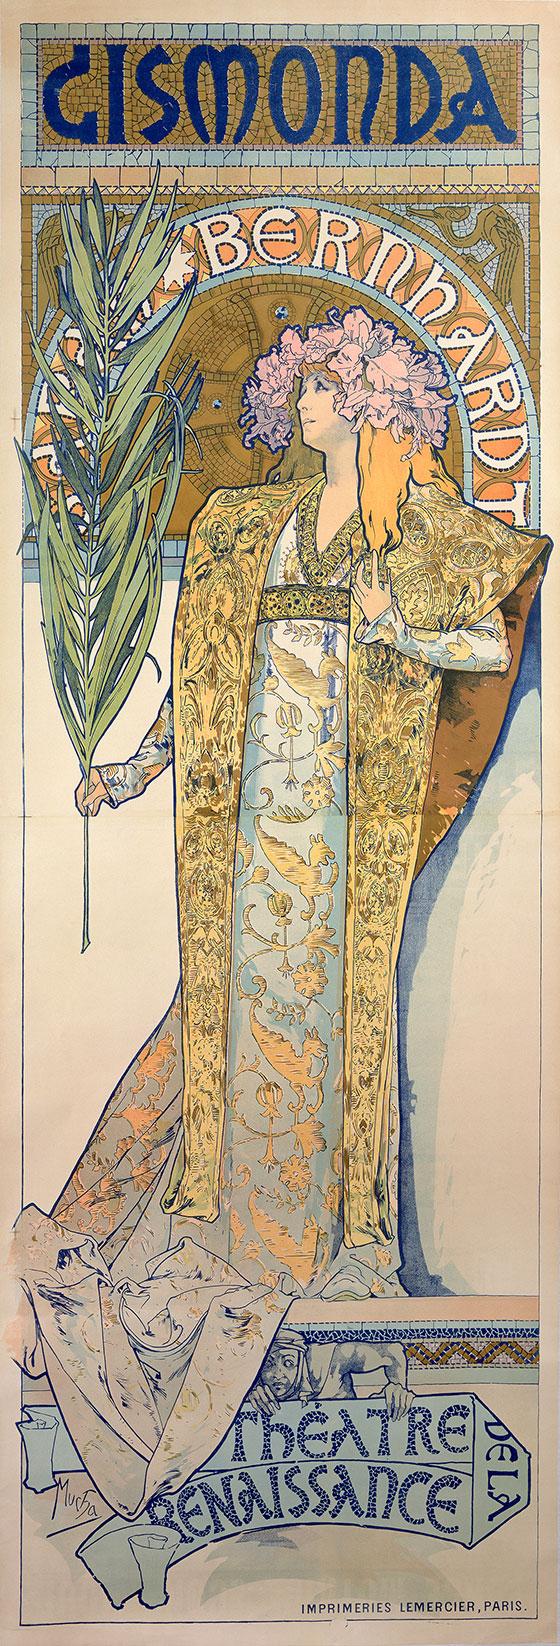 Alphonse Mucha, Plakat til Gismonda, 1894 © Mucha Trust 2018